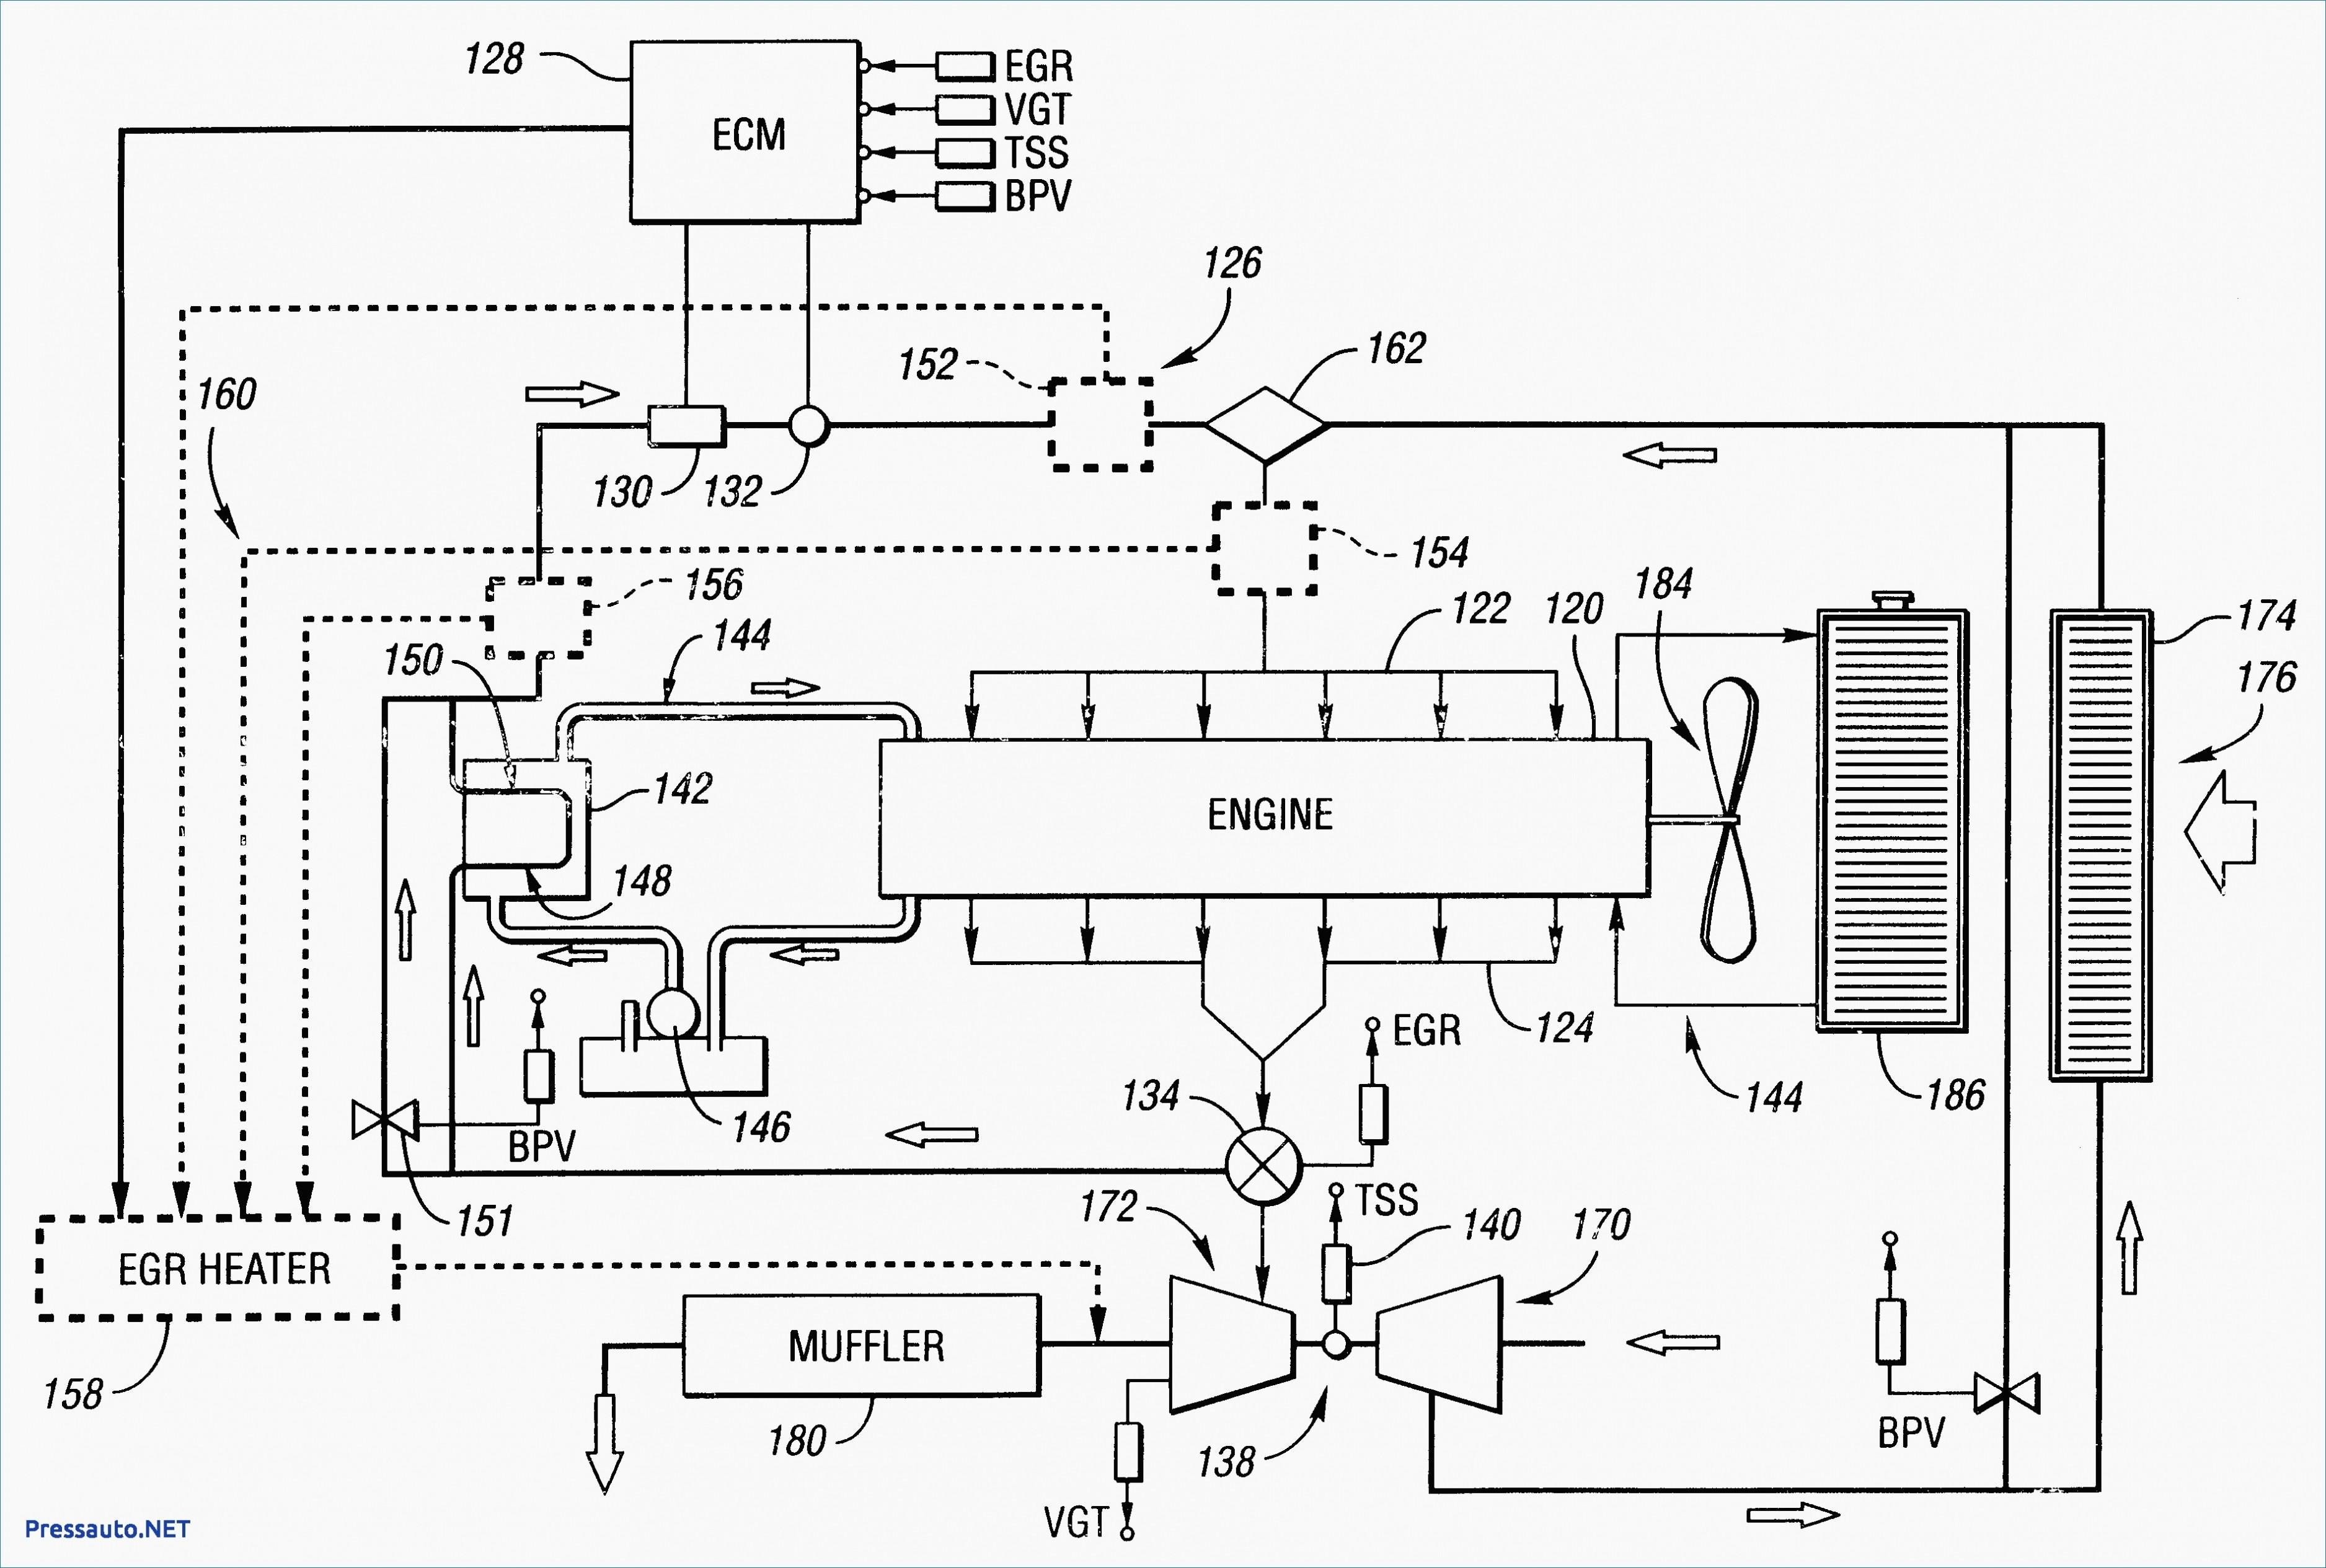 Intertherm Electric Furnace Wiring Diagram – Intertherm Electric Furnace Wiring Diagram Lorestanfo